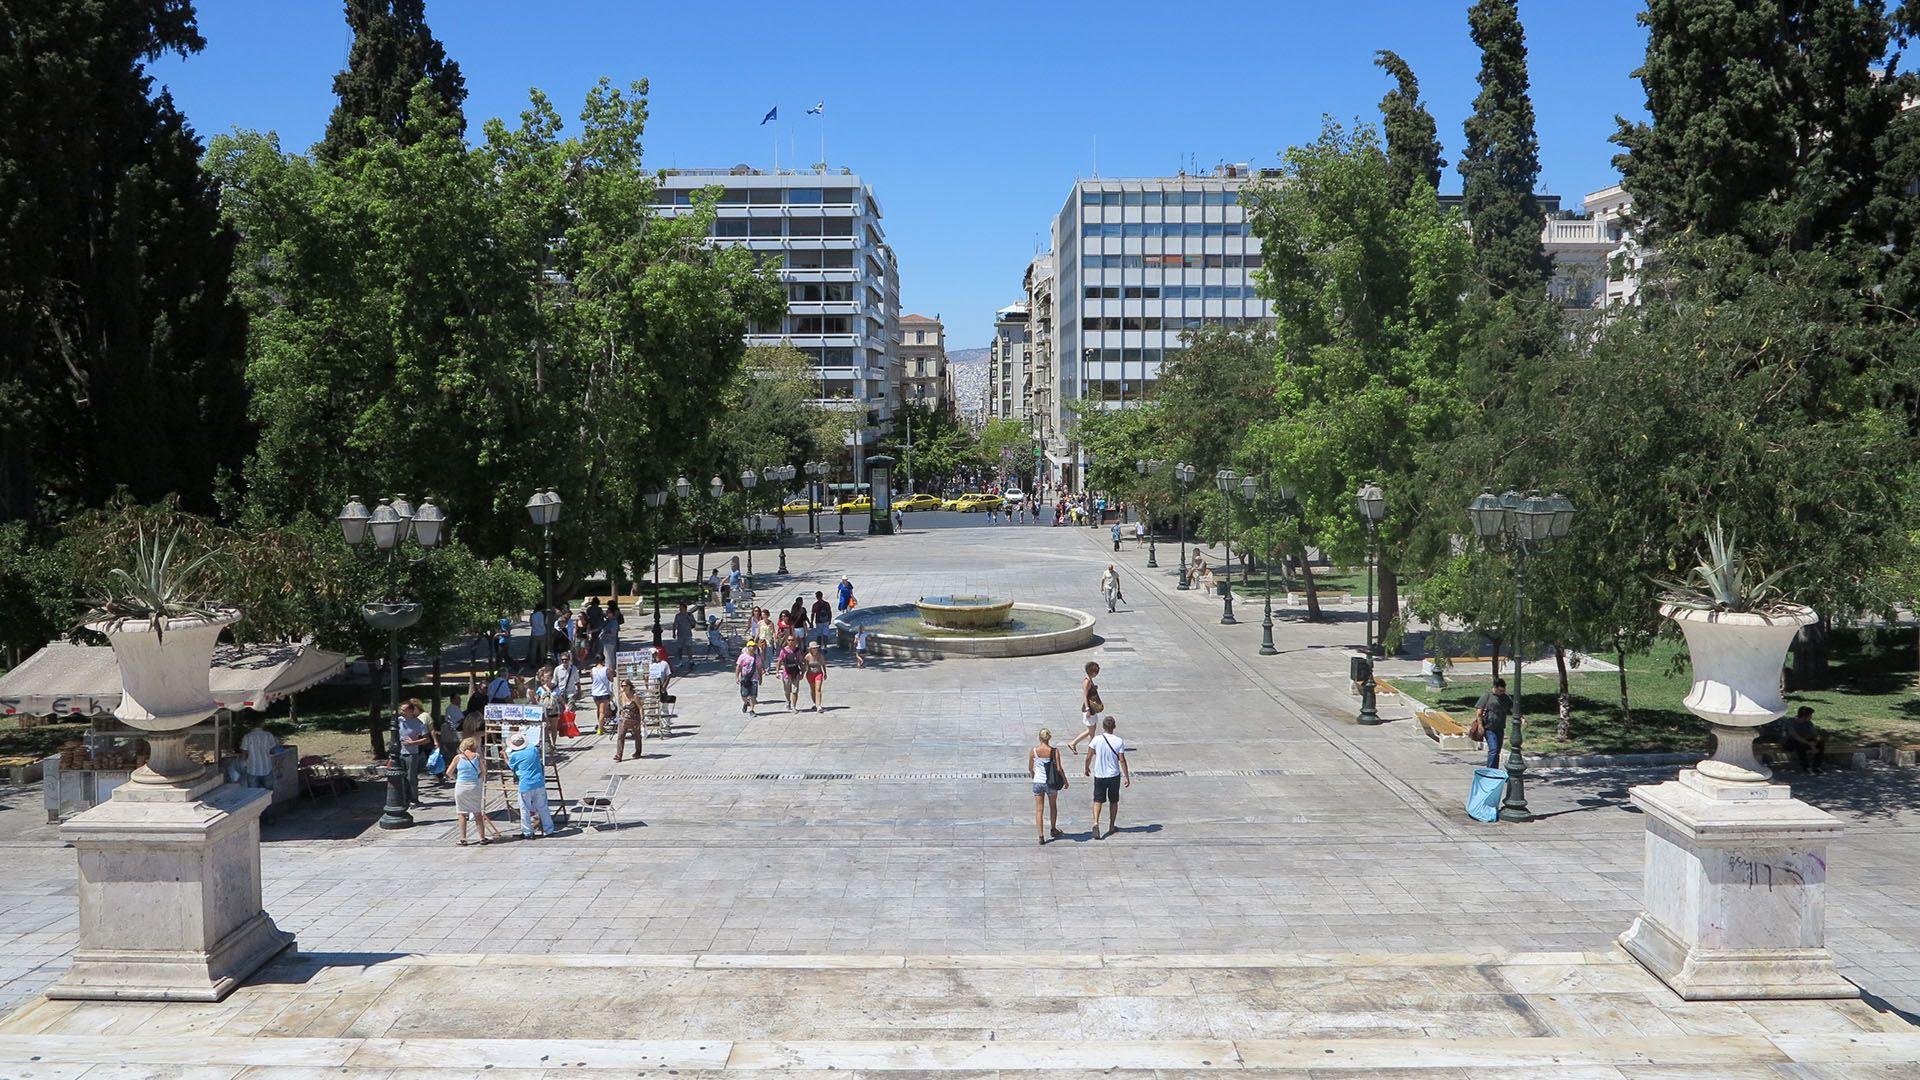 Square Syntagma Athens Πλατεία Σύνταγμα Αθήνα